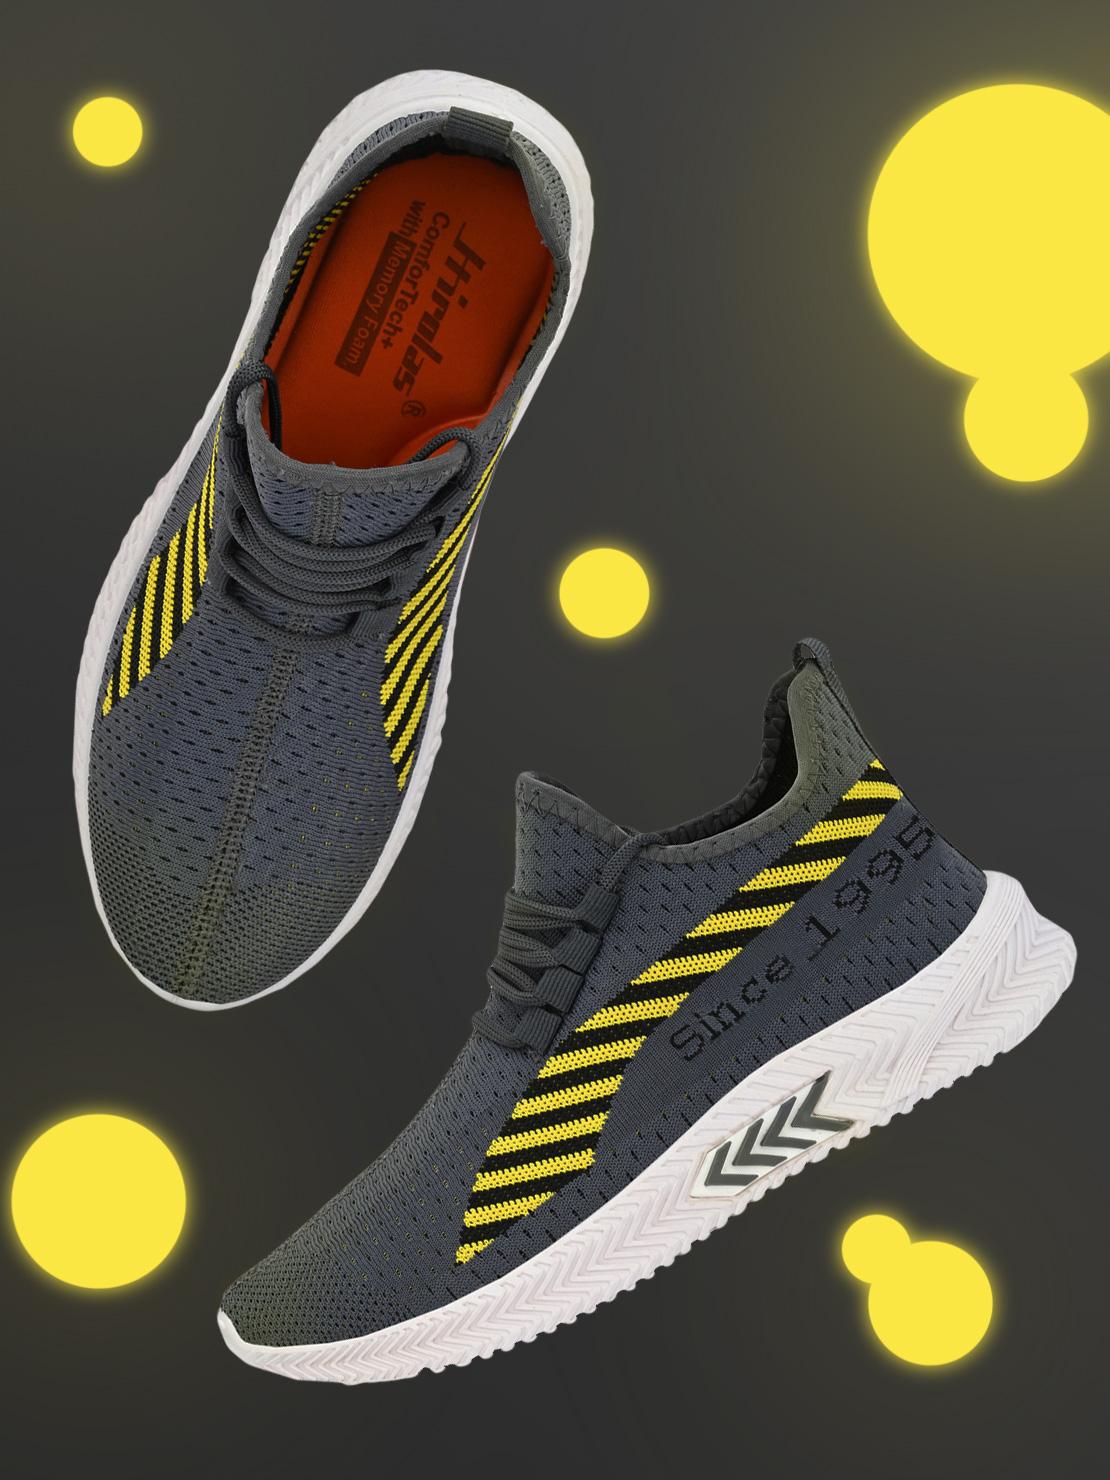 Hirolas   Hirolas® Men's Grey Knitted Running/Gym/Walking athleisure Sports Sneaker Shoes